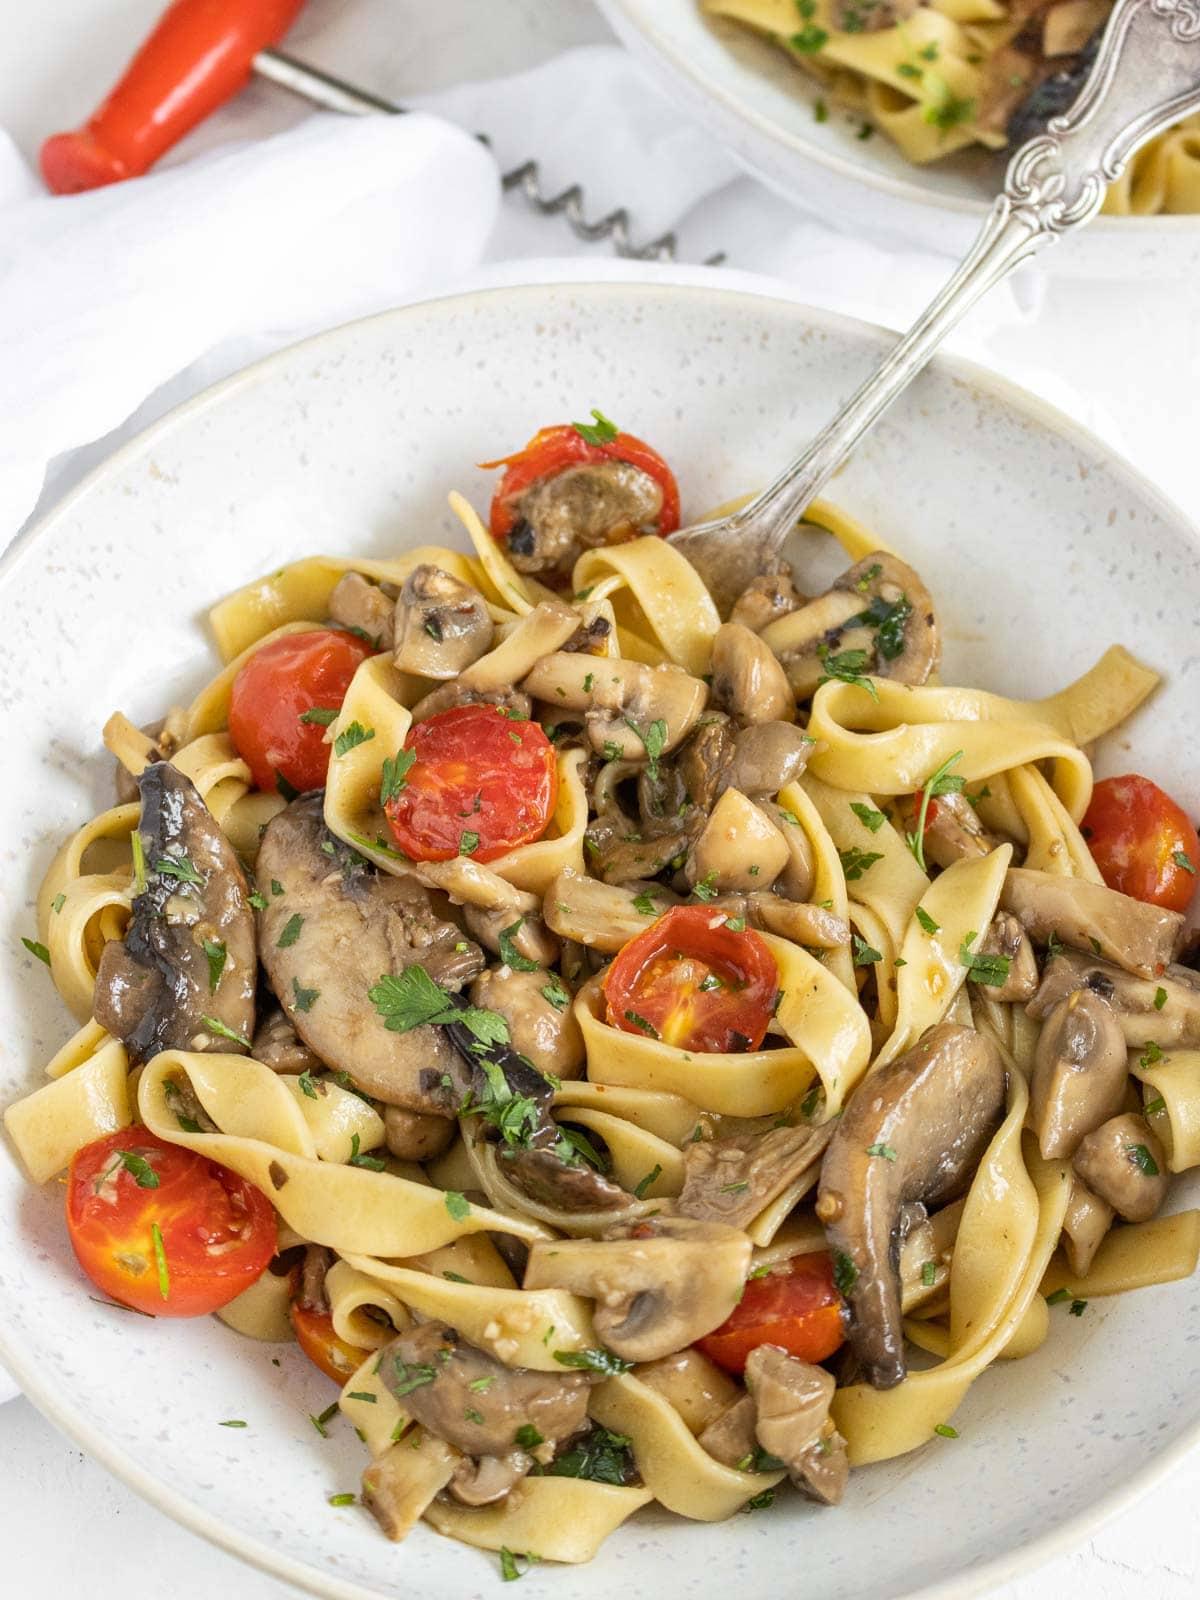 vegan mushroom pasta in a plate